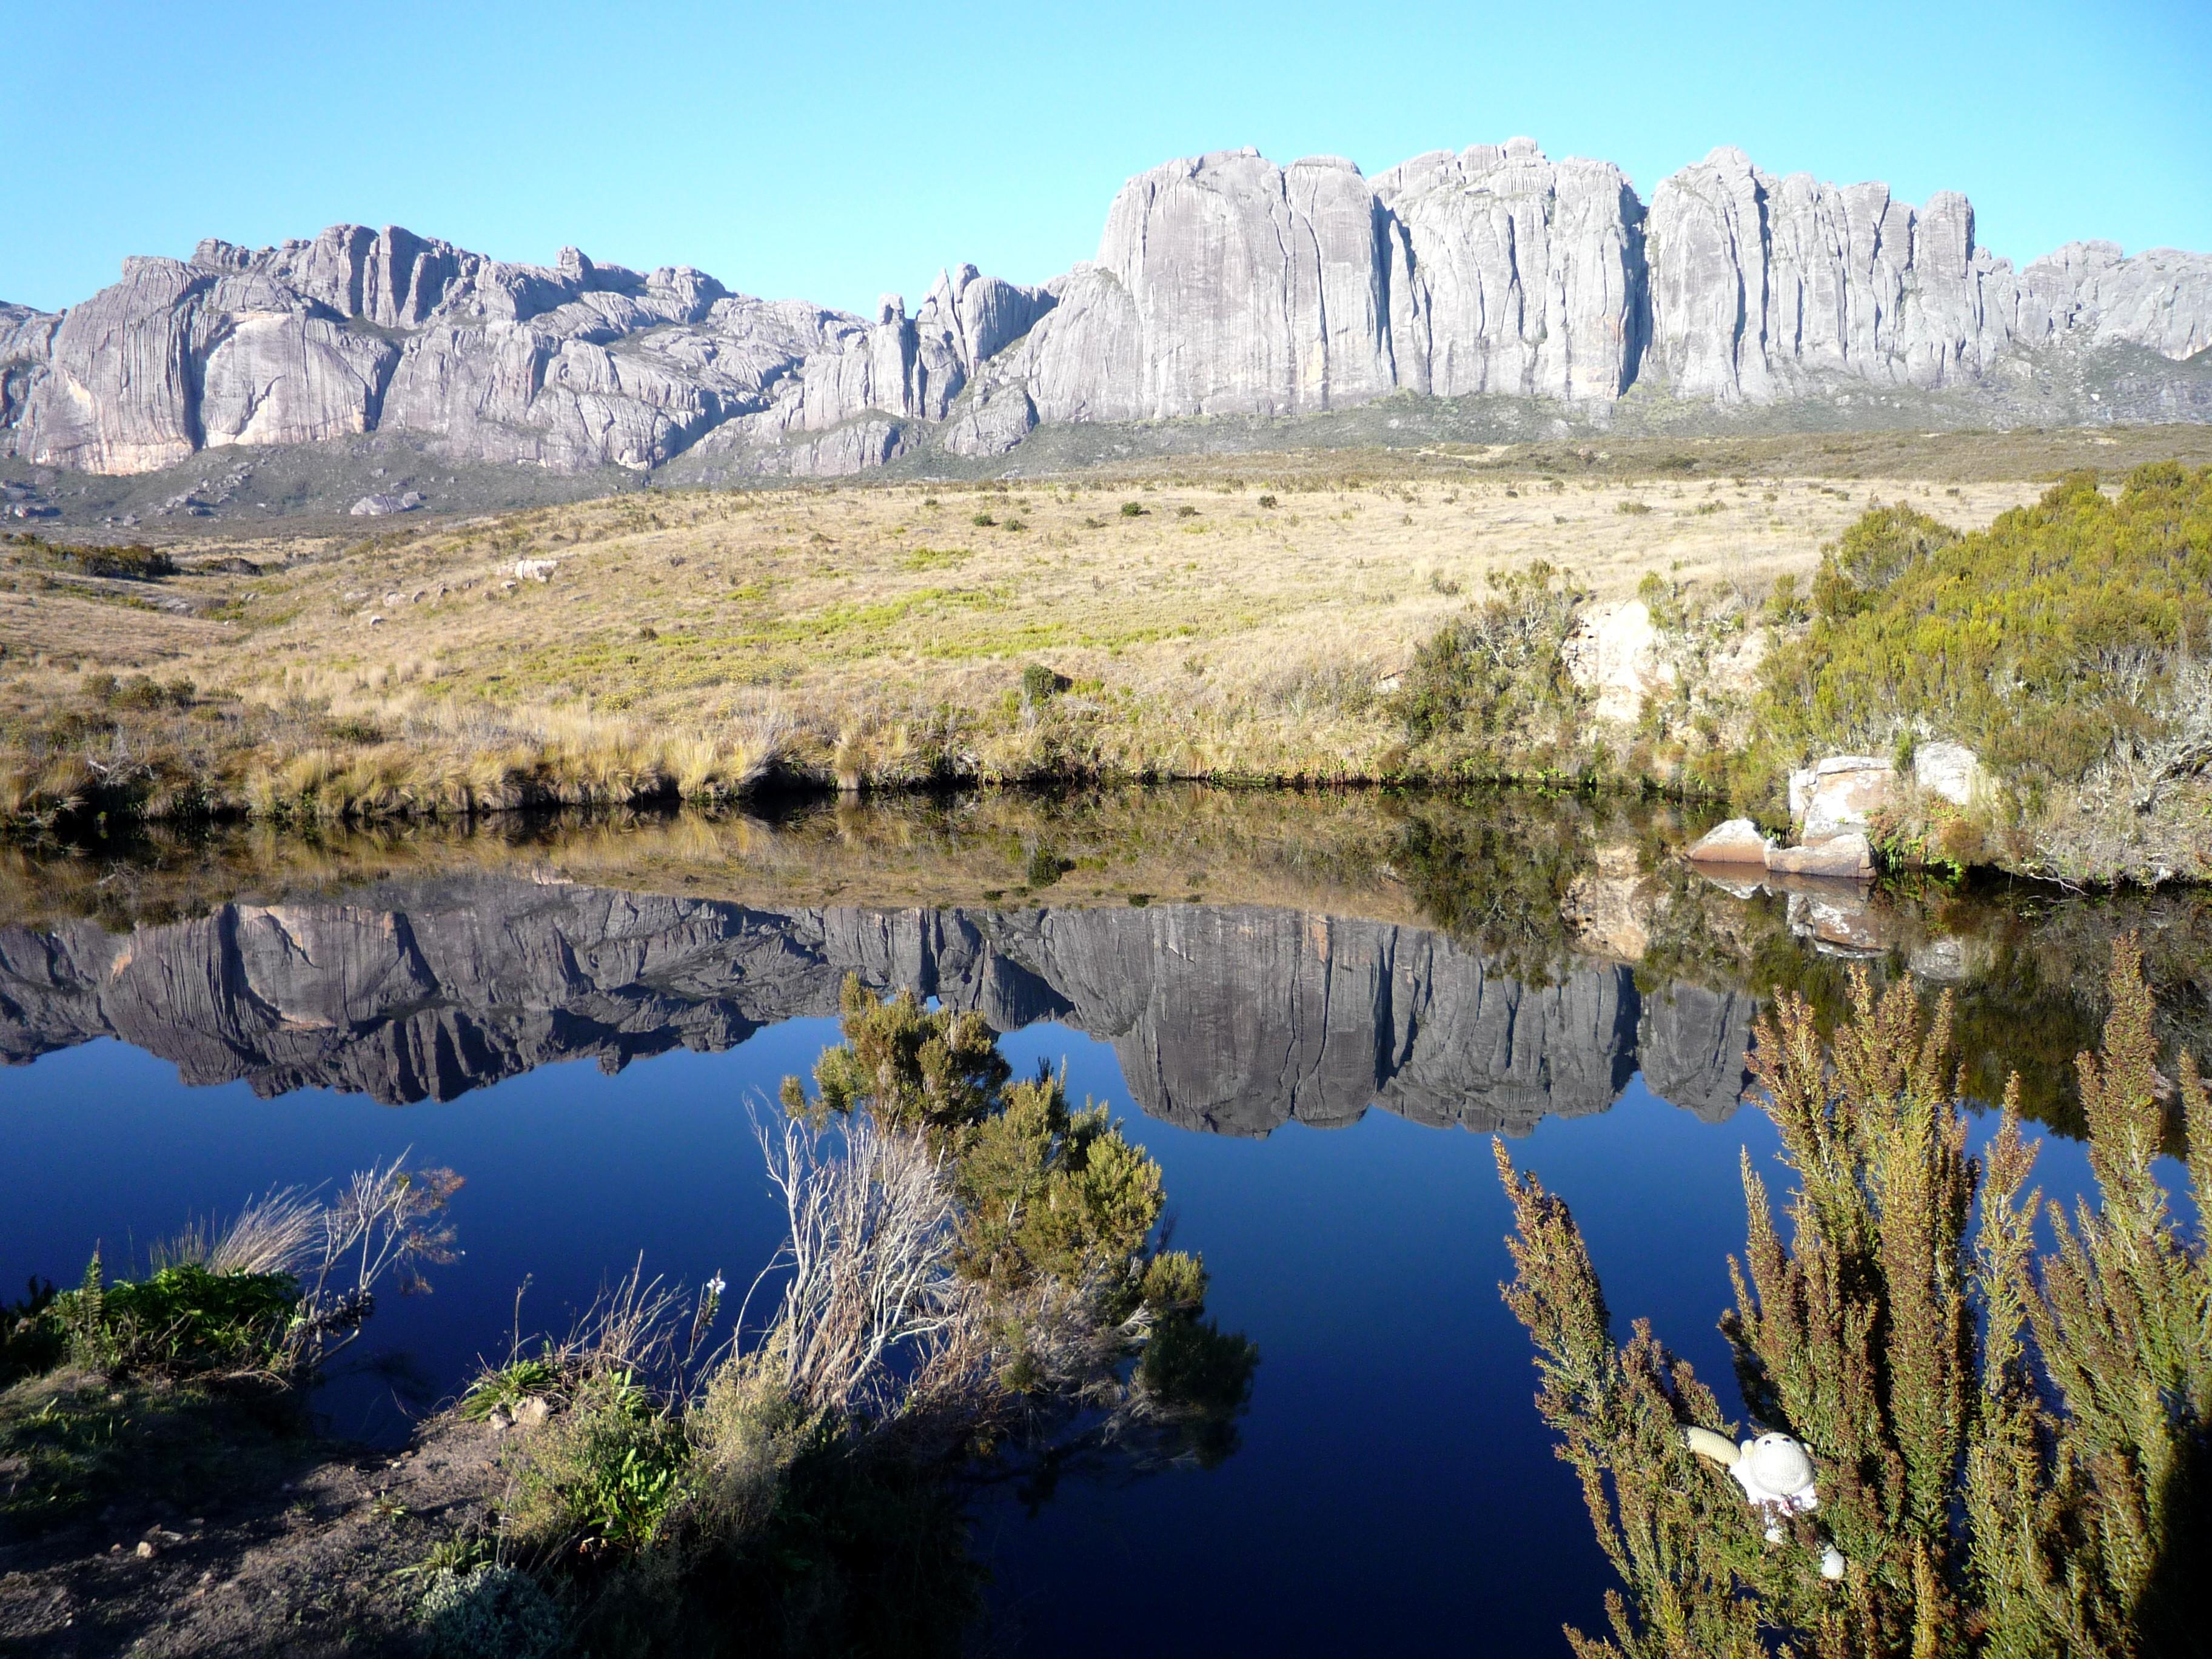 Andringitra%2C_Madagascar_by_Effervescin